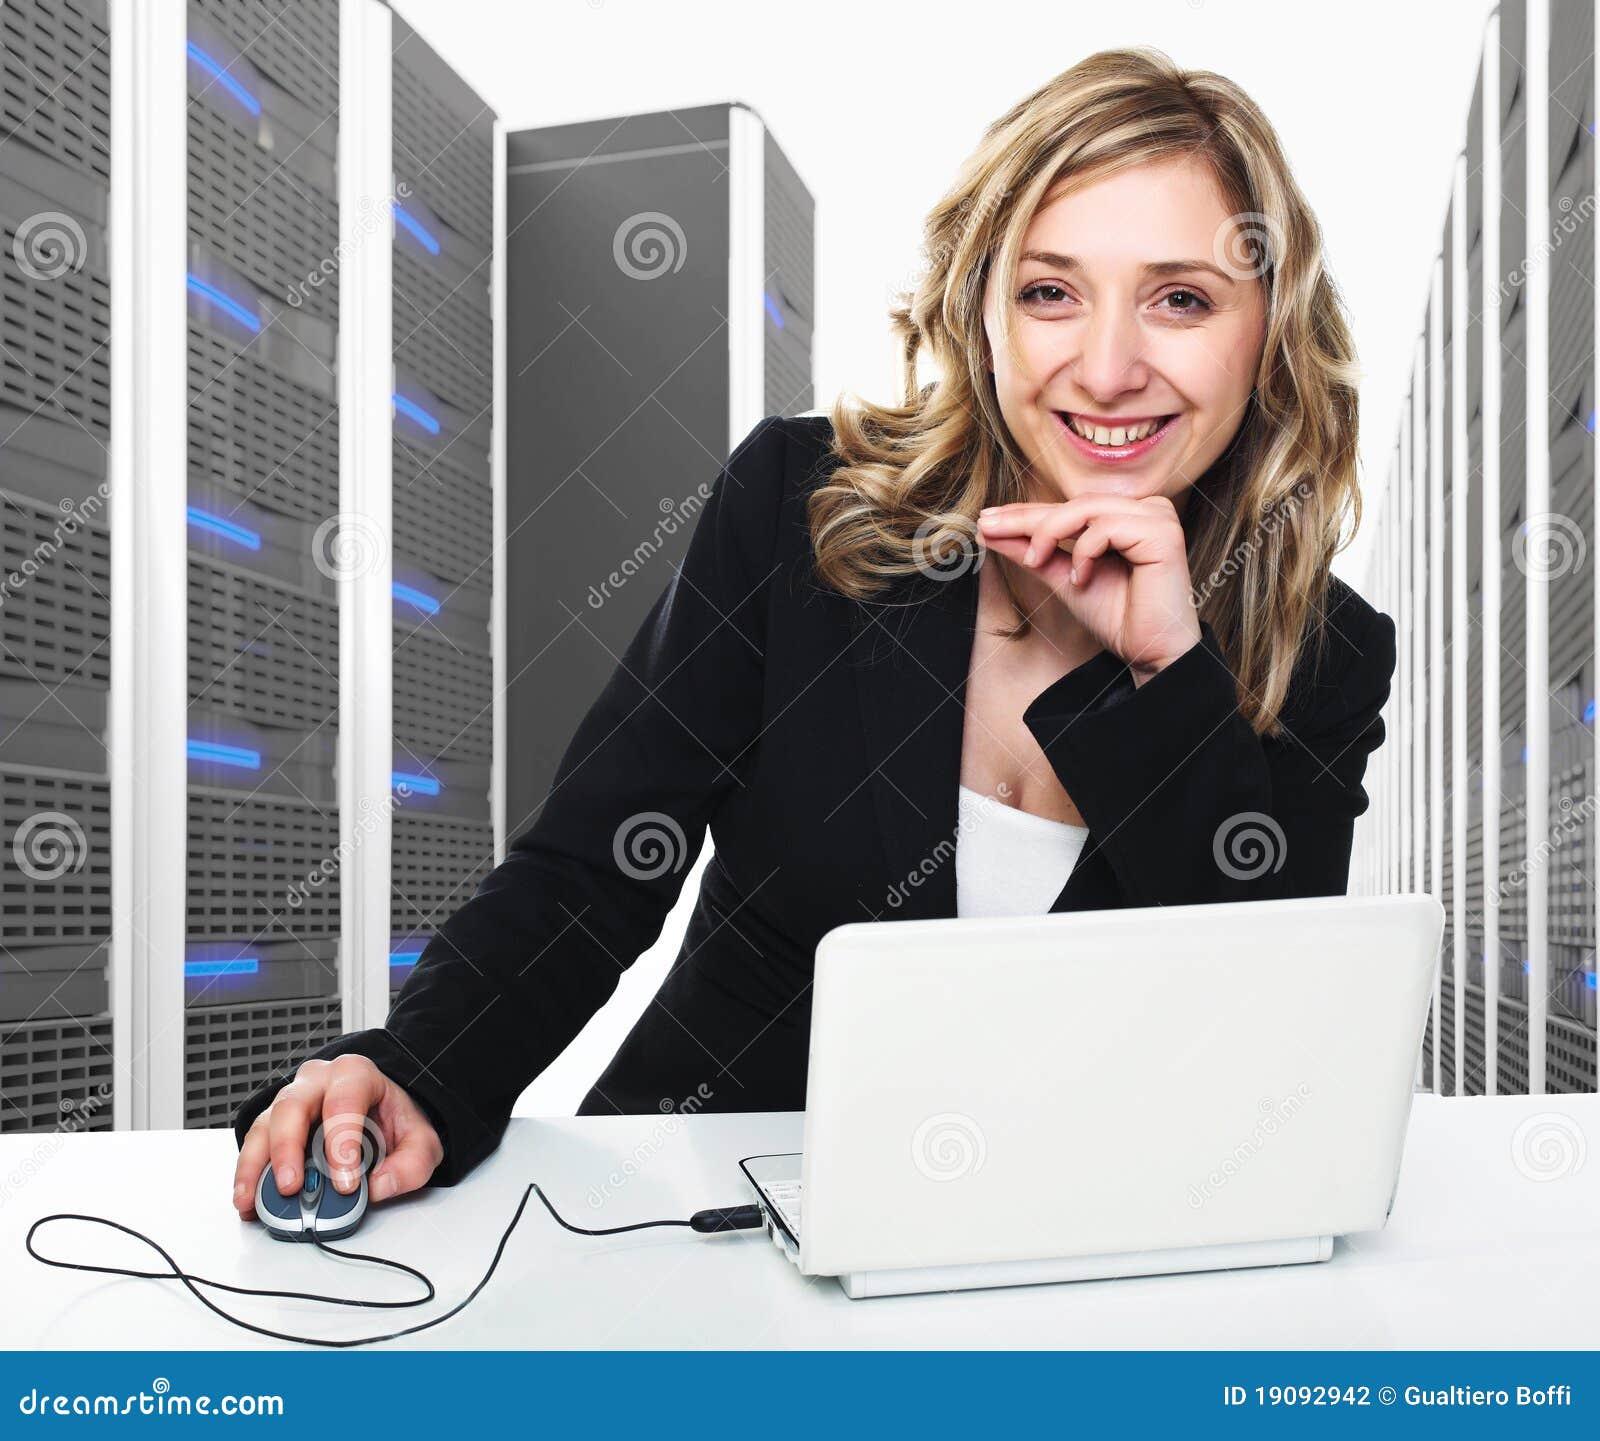 Virtuele 3d server en vrouw